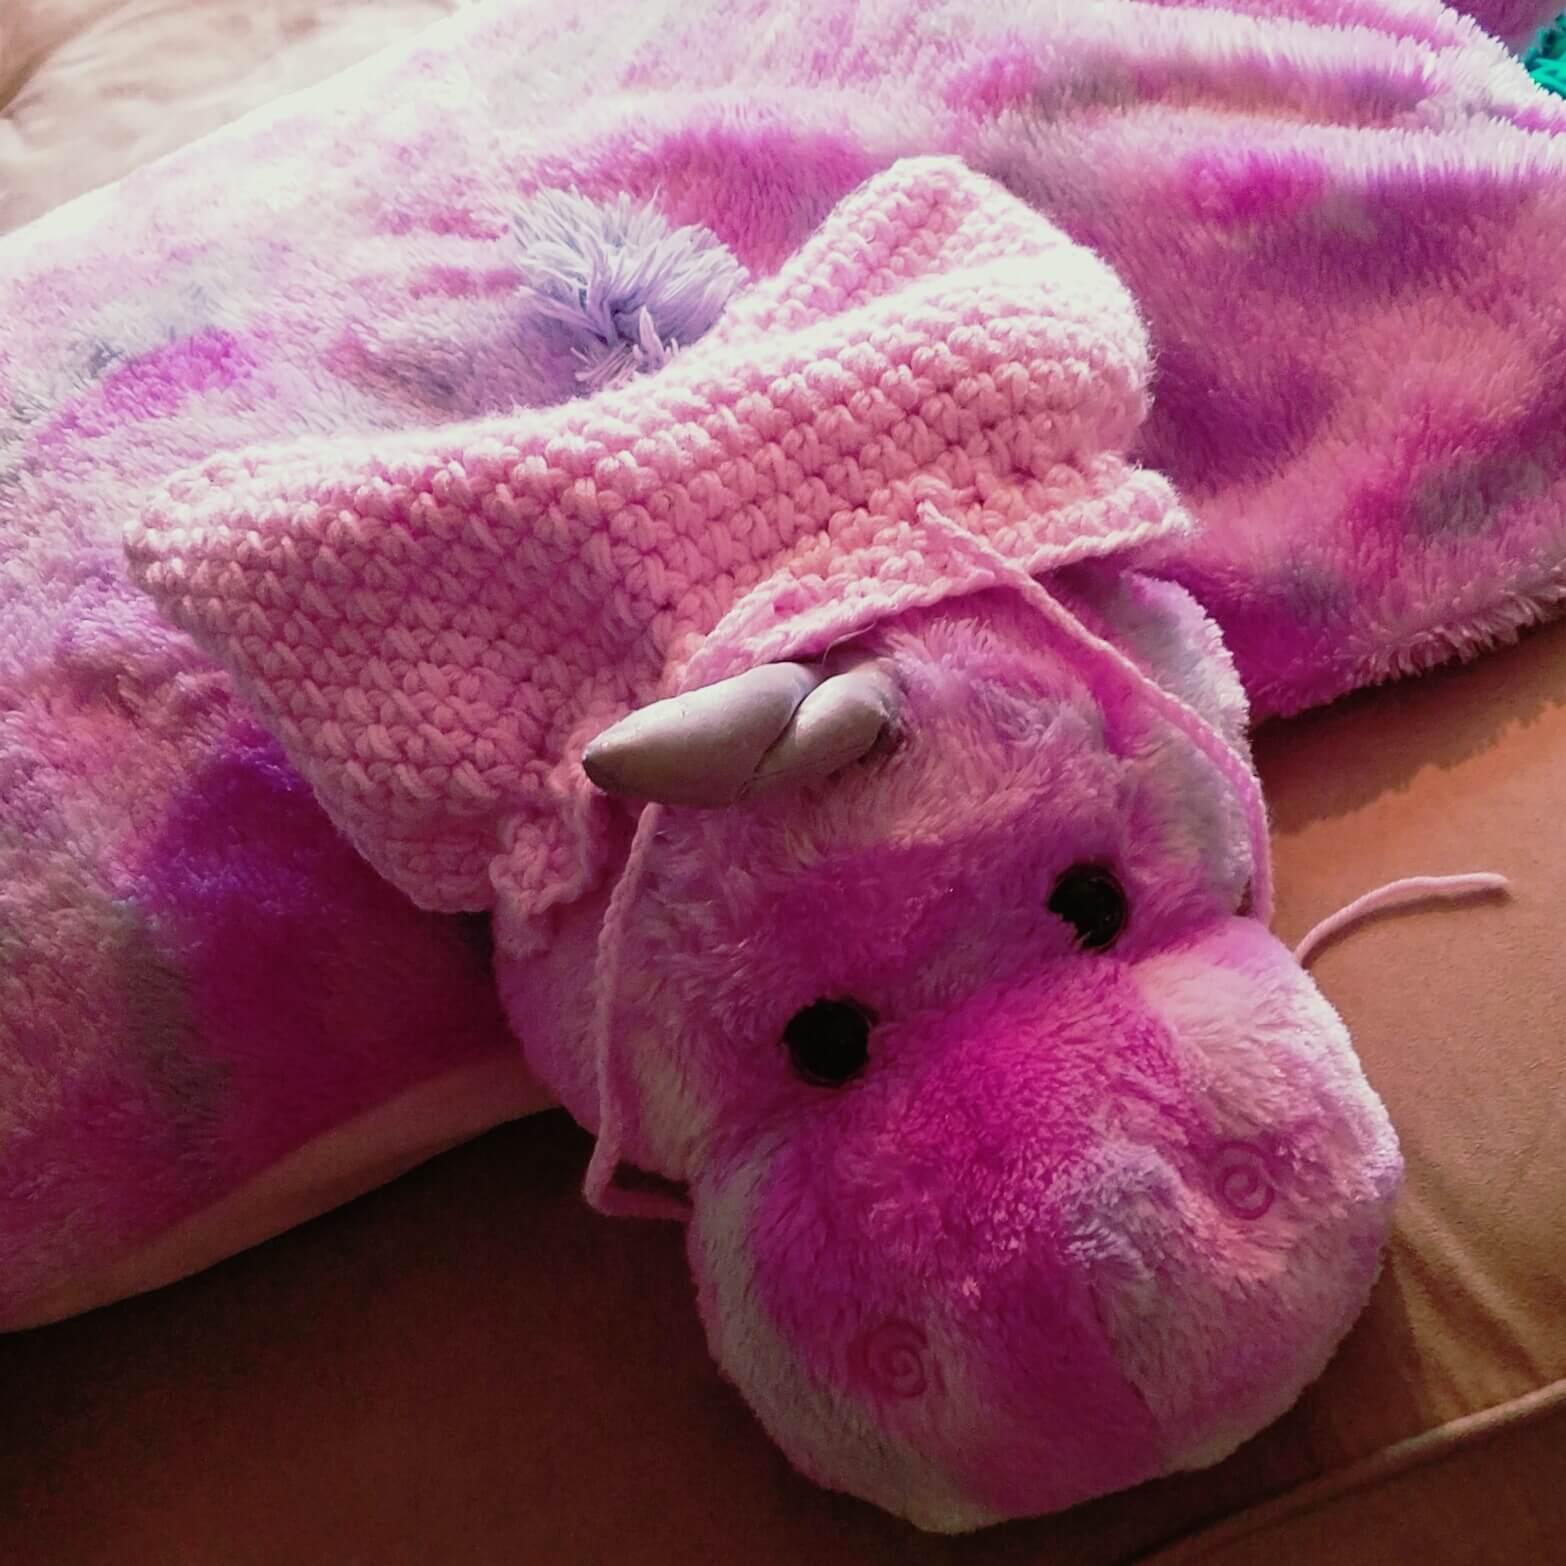 pink stuffed unicorn wearing one of the women's march pink hats